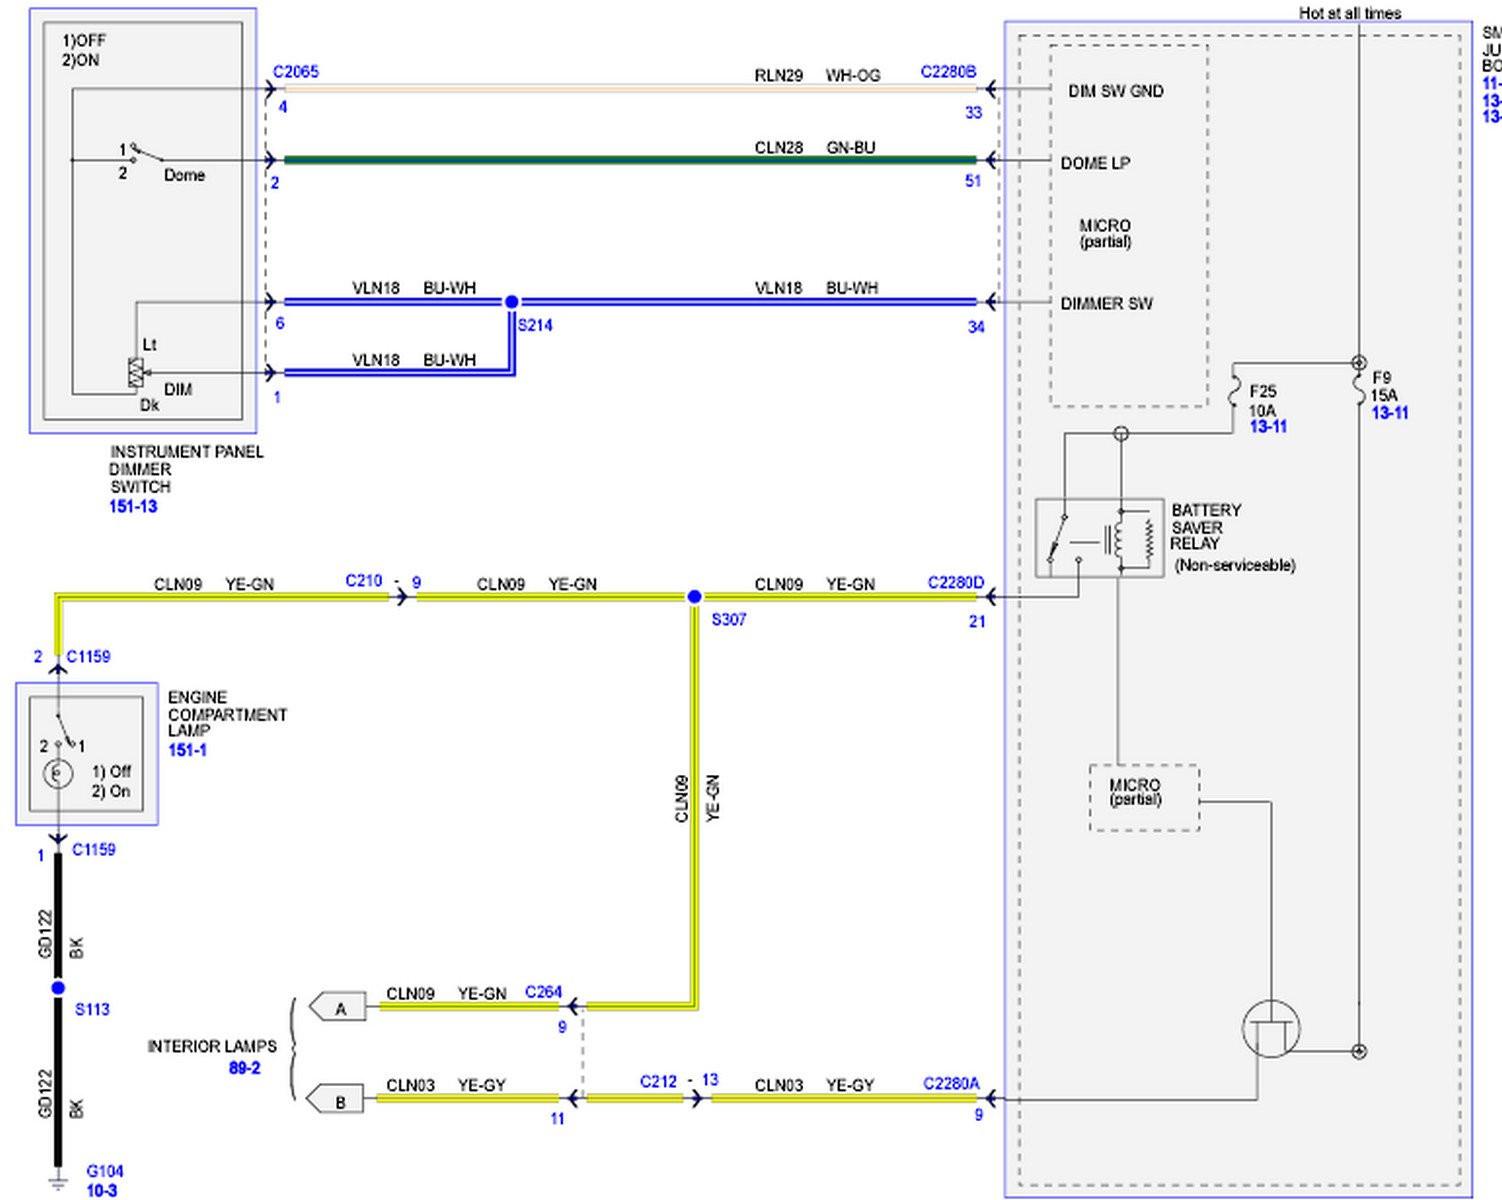 84 C10 Door Dome Light Switch Wiring Diagram] toyota Dome Light Wiring Diagram Full Version Hd Quality … Of 84 C10 Door Dome Light Switch Wiring